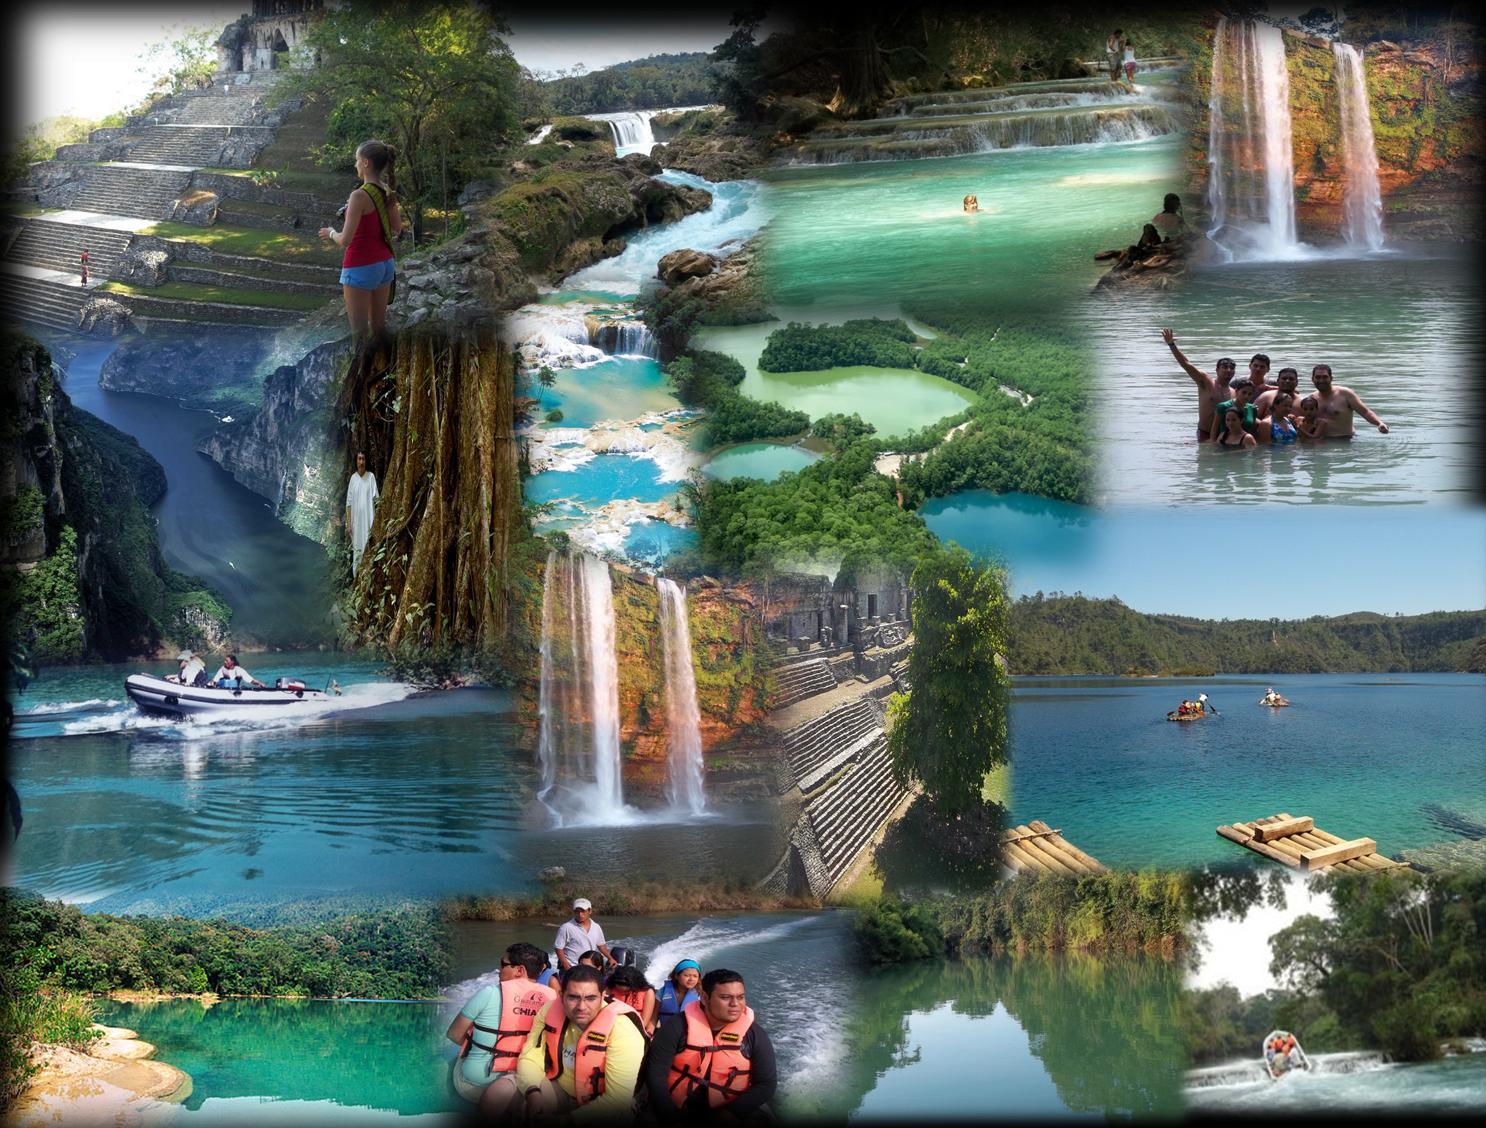 Chiapas Eco Tours for Android - APK Download